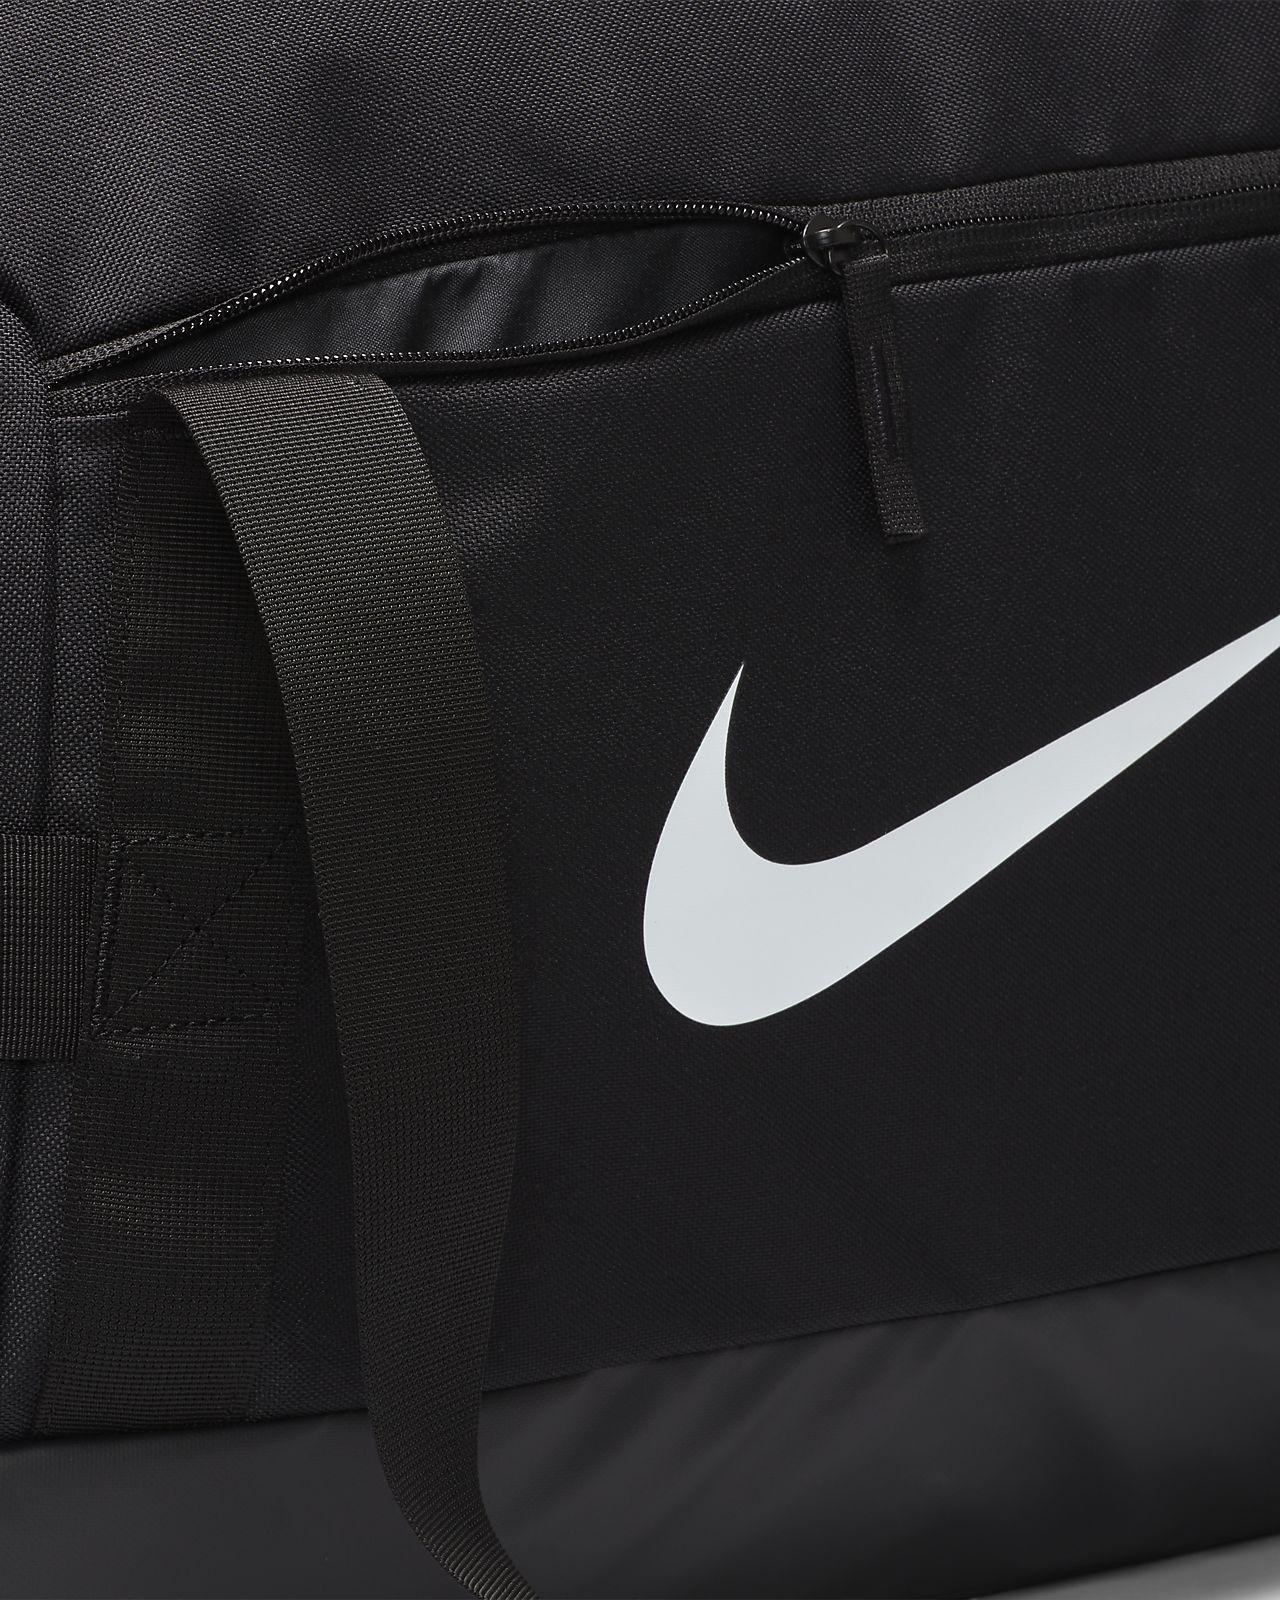 Fotbollsväska Nike Academy Team (Large)